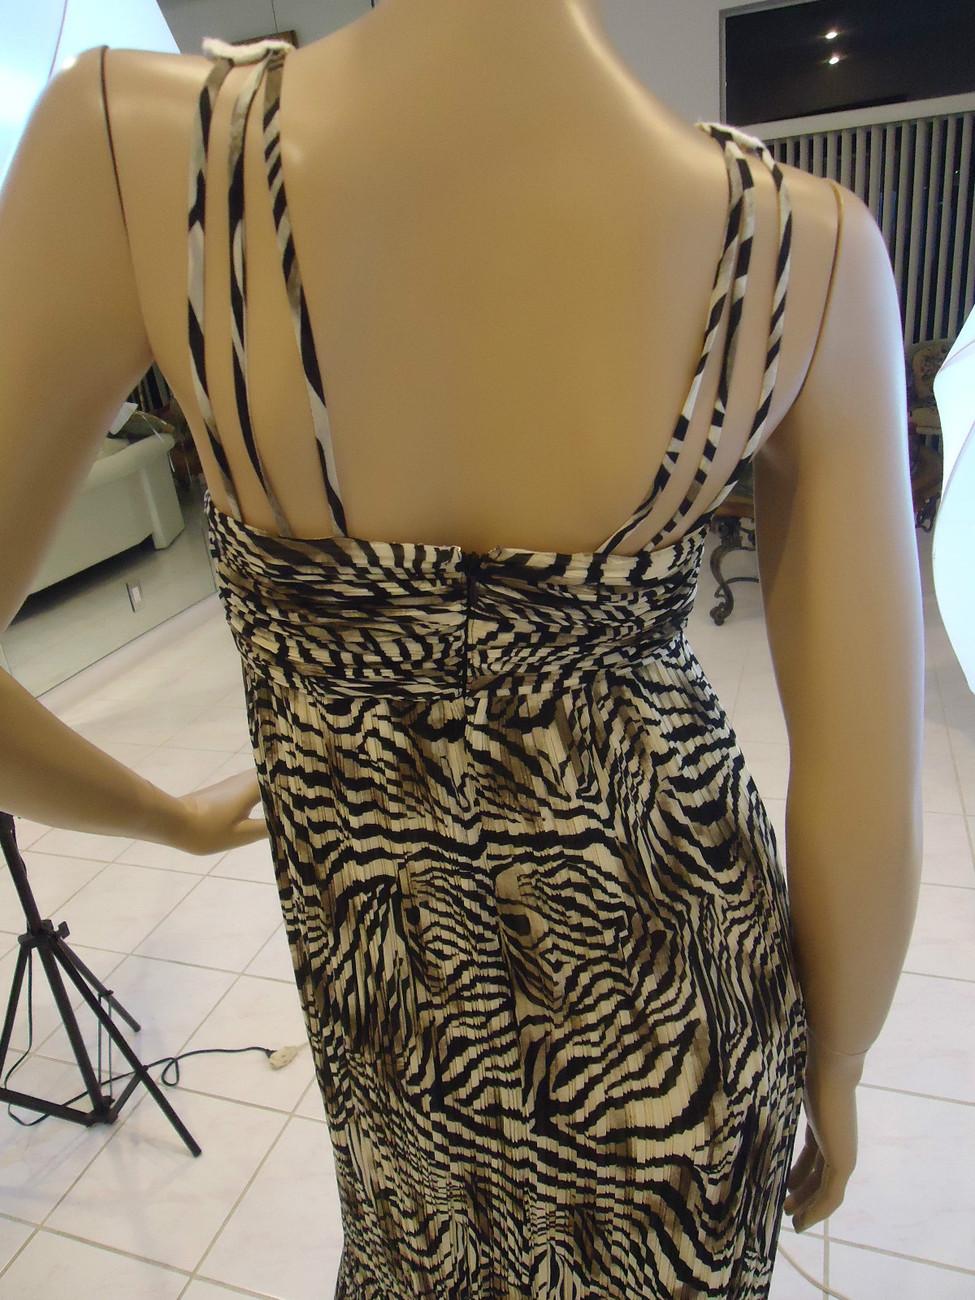 Boston Proper MUSE Pleated Animal Print Crochet Long Maxi Dress Size 4 NWT